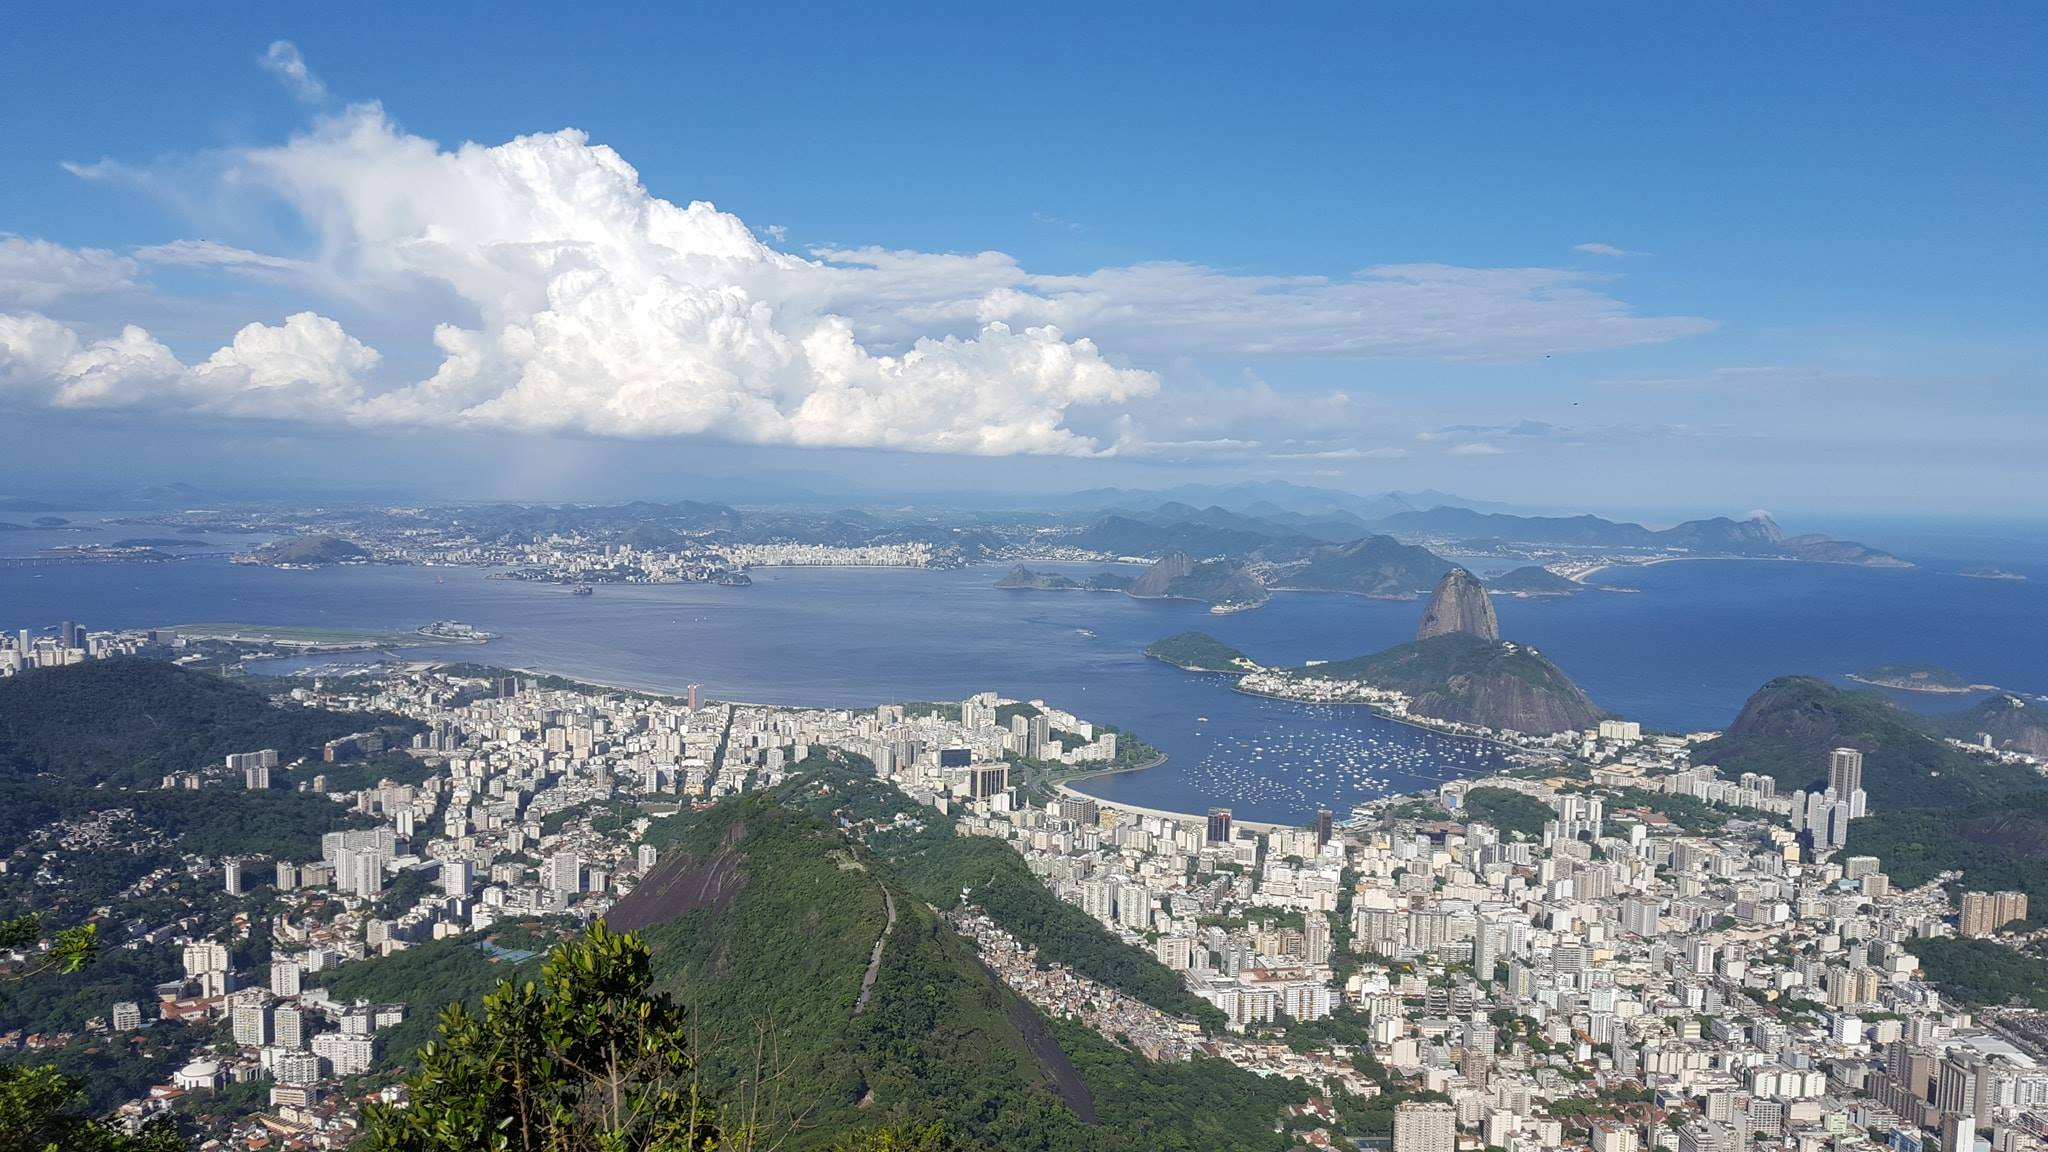 Cidade Maravilhosa! Vista do Rio de Janeiro a partir do topo do Corcovado.